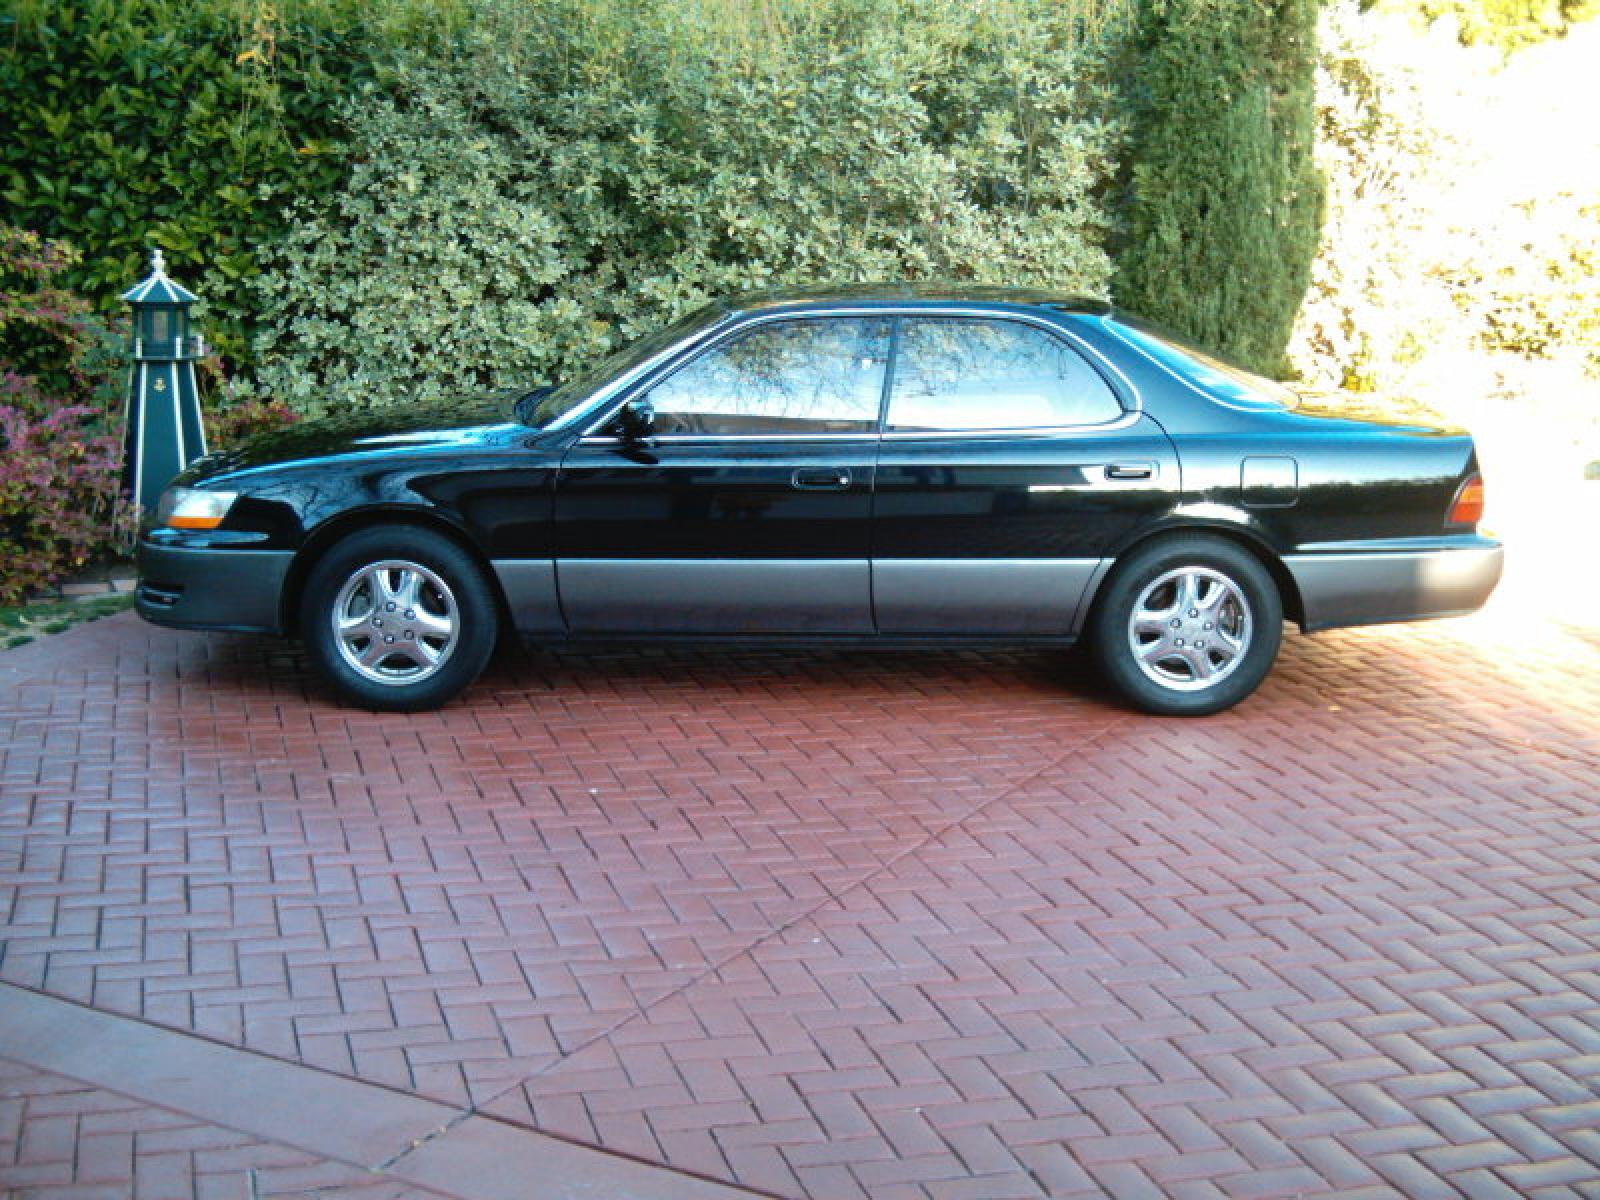 1995 lexus es 300 information and photos zombiedrive rh zombdrive com 1996 Lexus ES 300 1999 Lexus ES 300 Interior